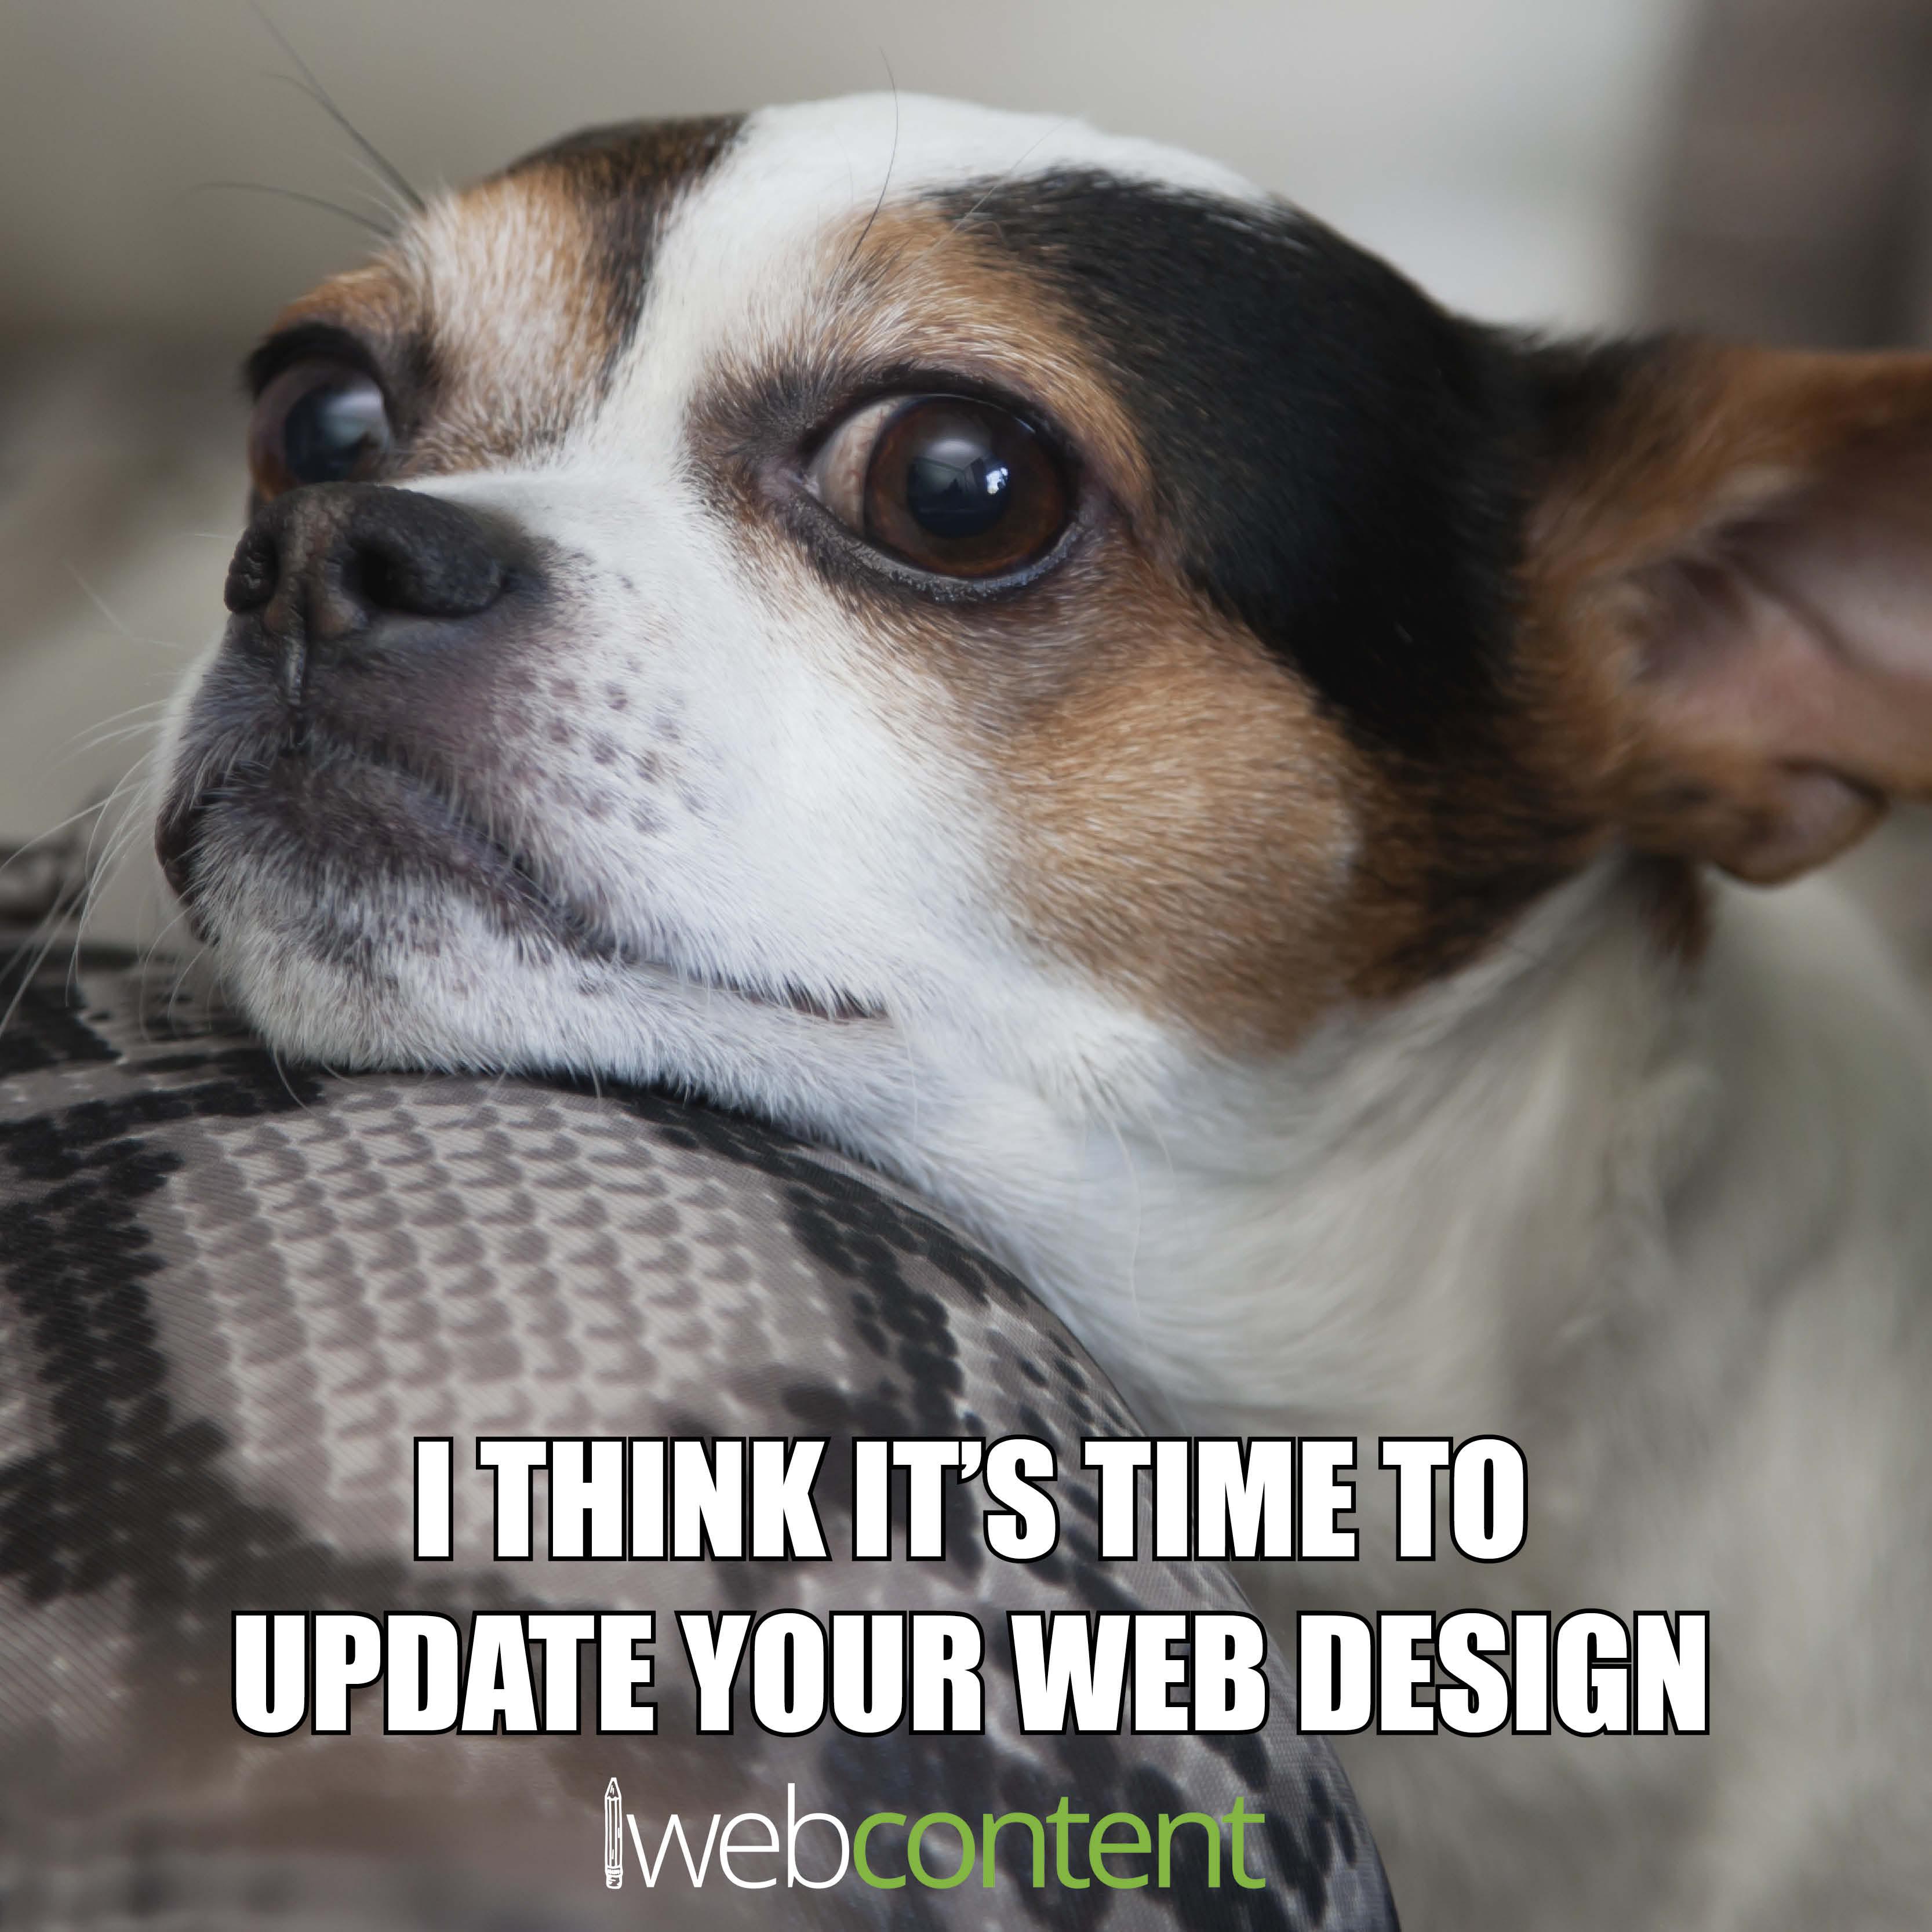 Time for a Website Design Update